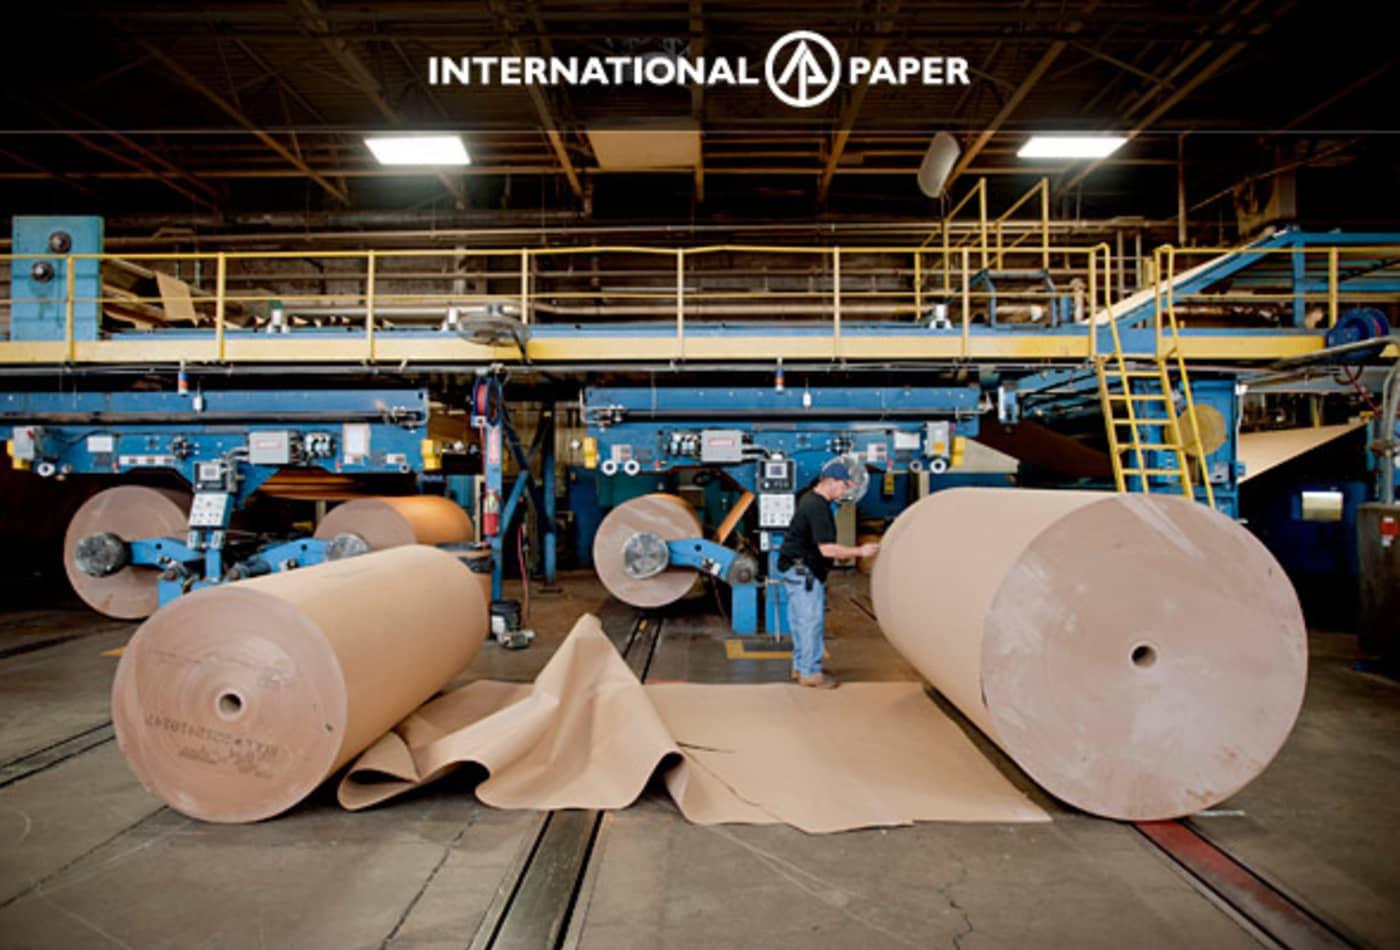 47177765 International-Paper-IP-Top-10-Dividend-Stocks.jpg